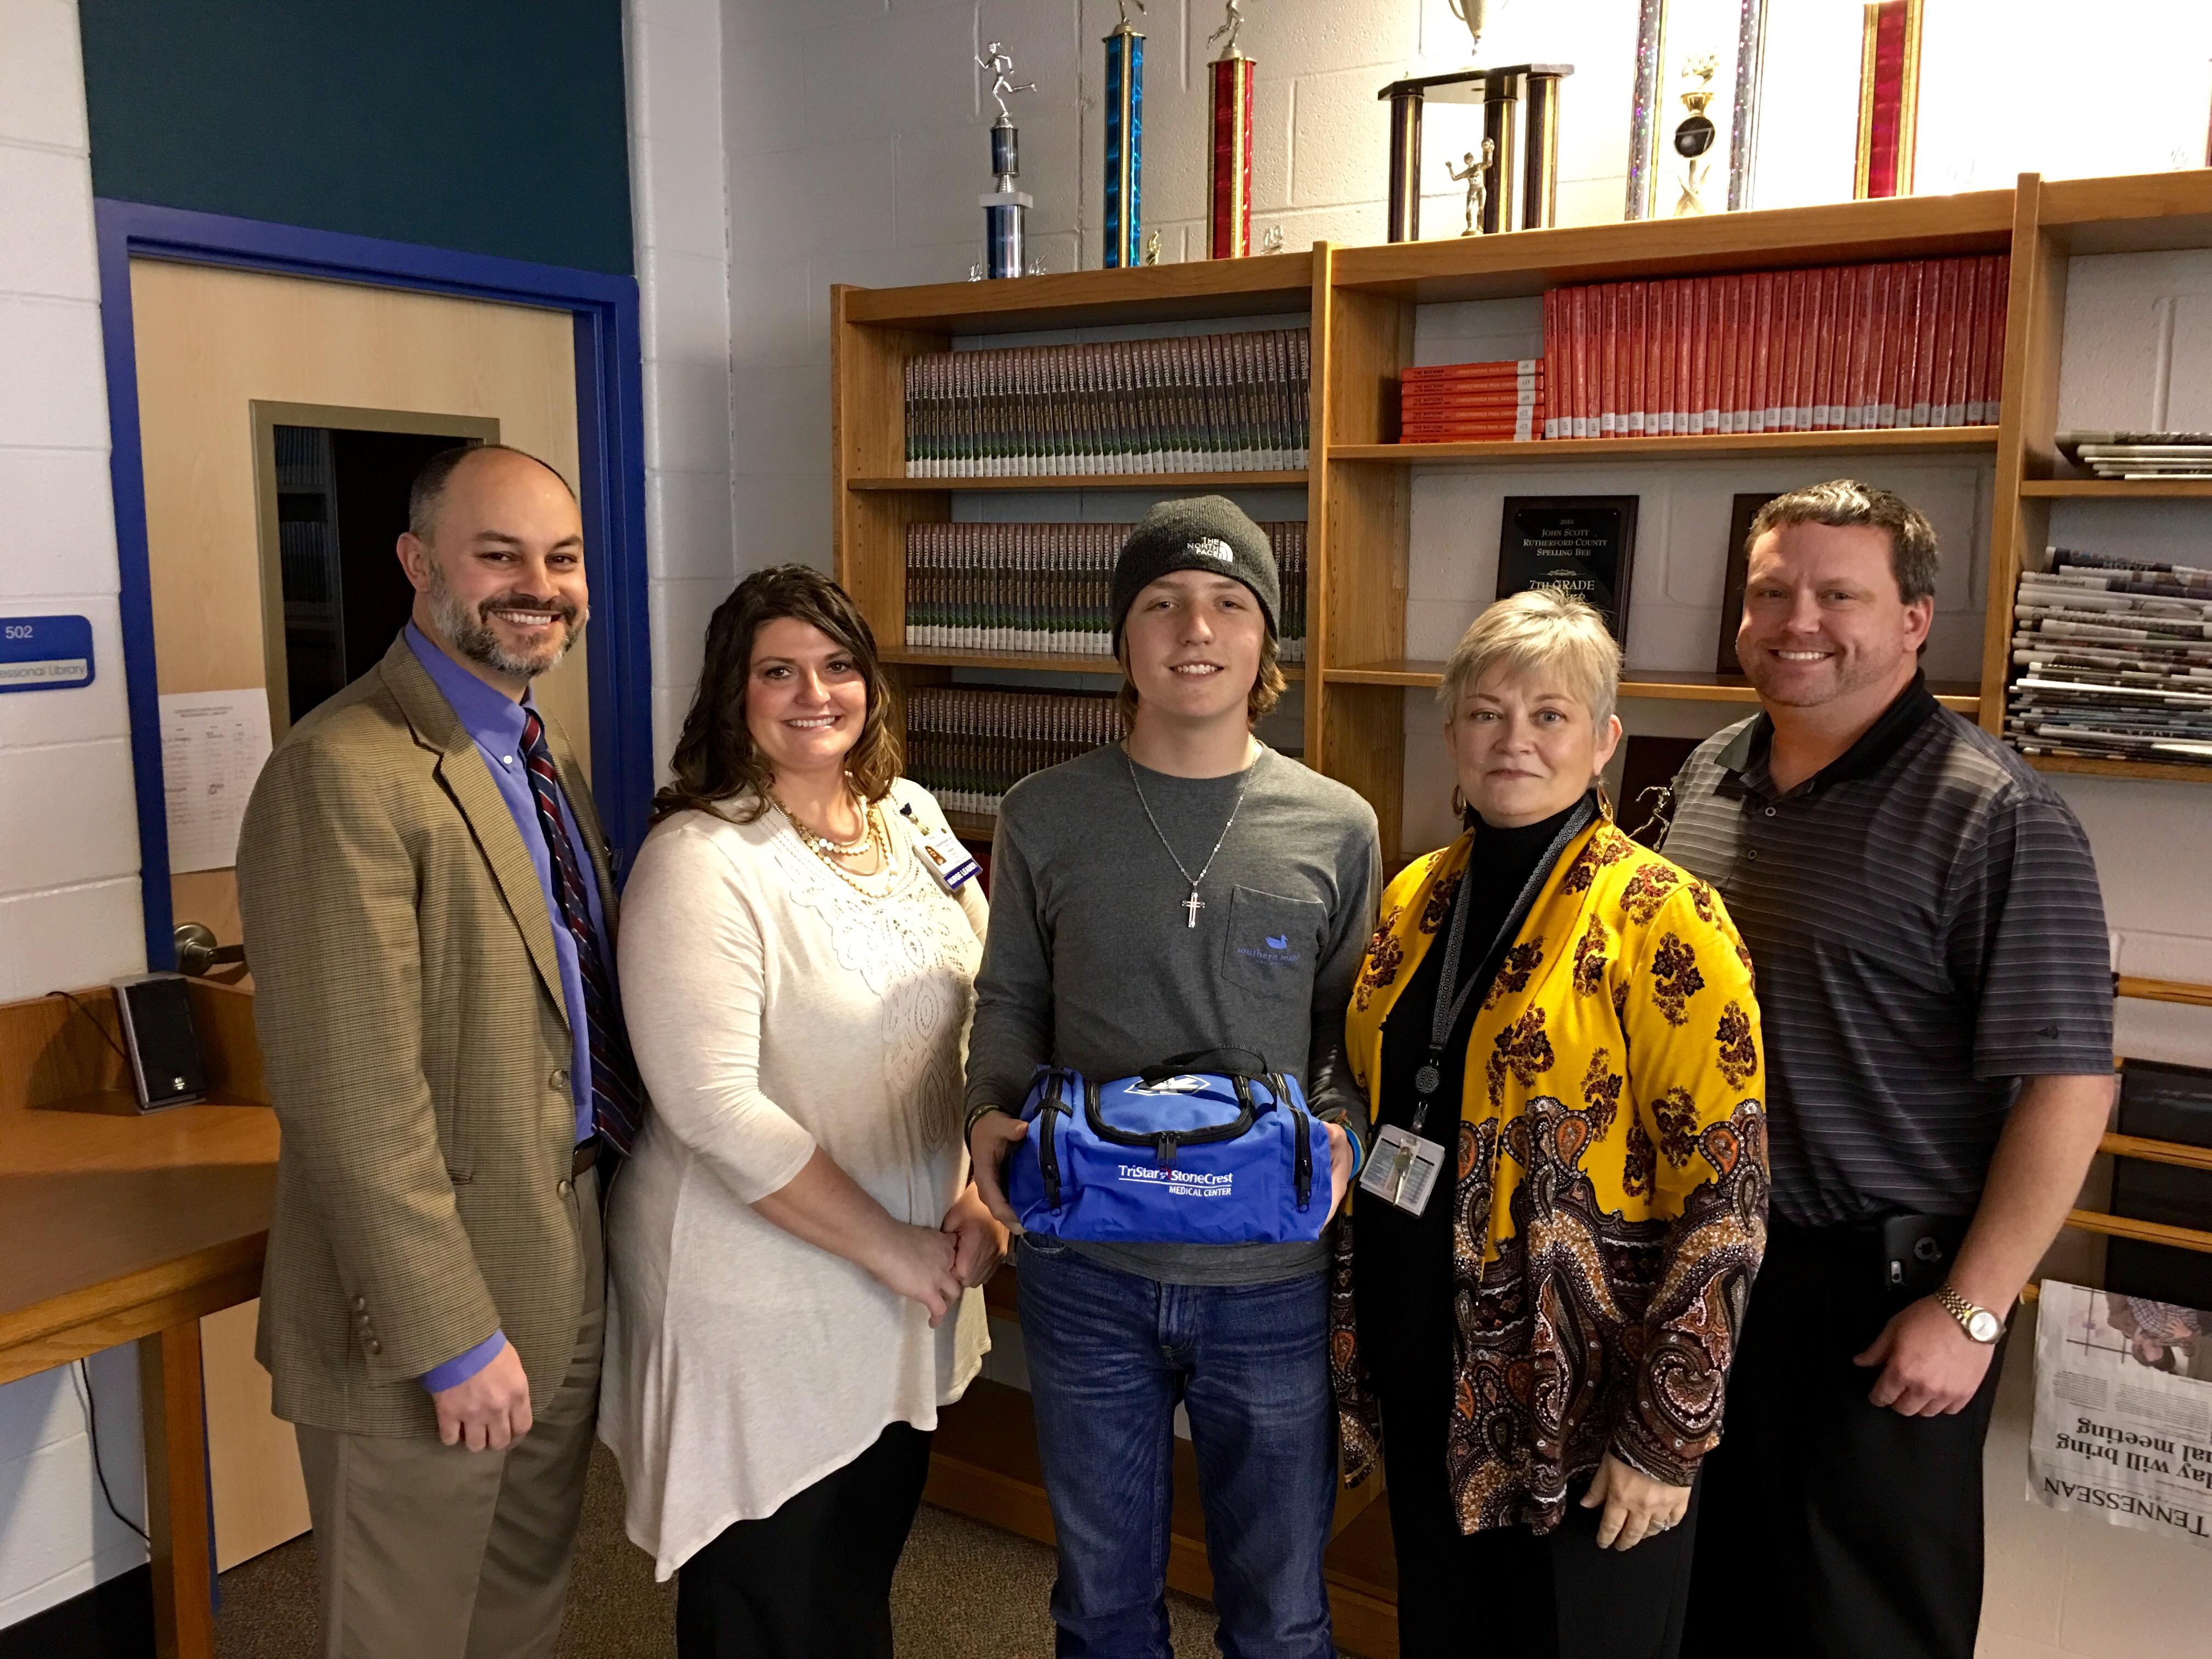 Siegel Middle presented Victory-Bratcher First Aid Emergency Responder Bag